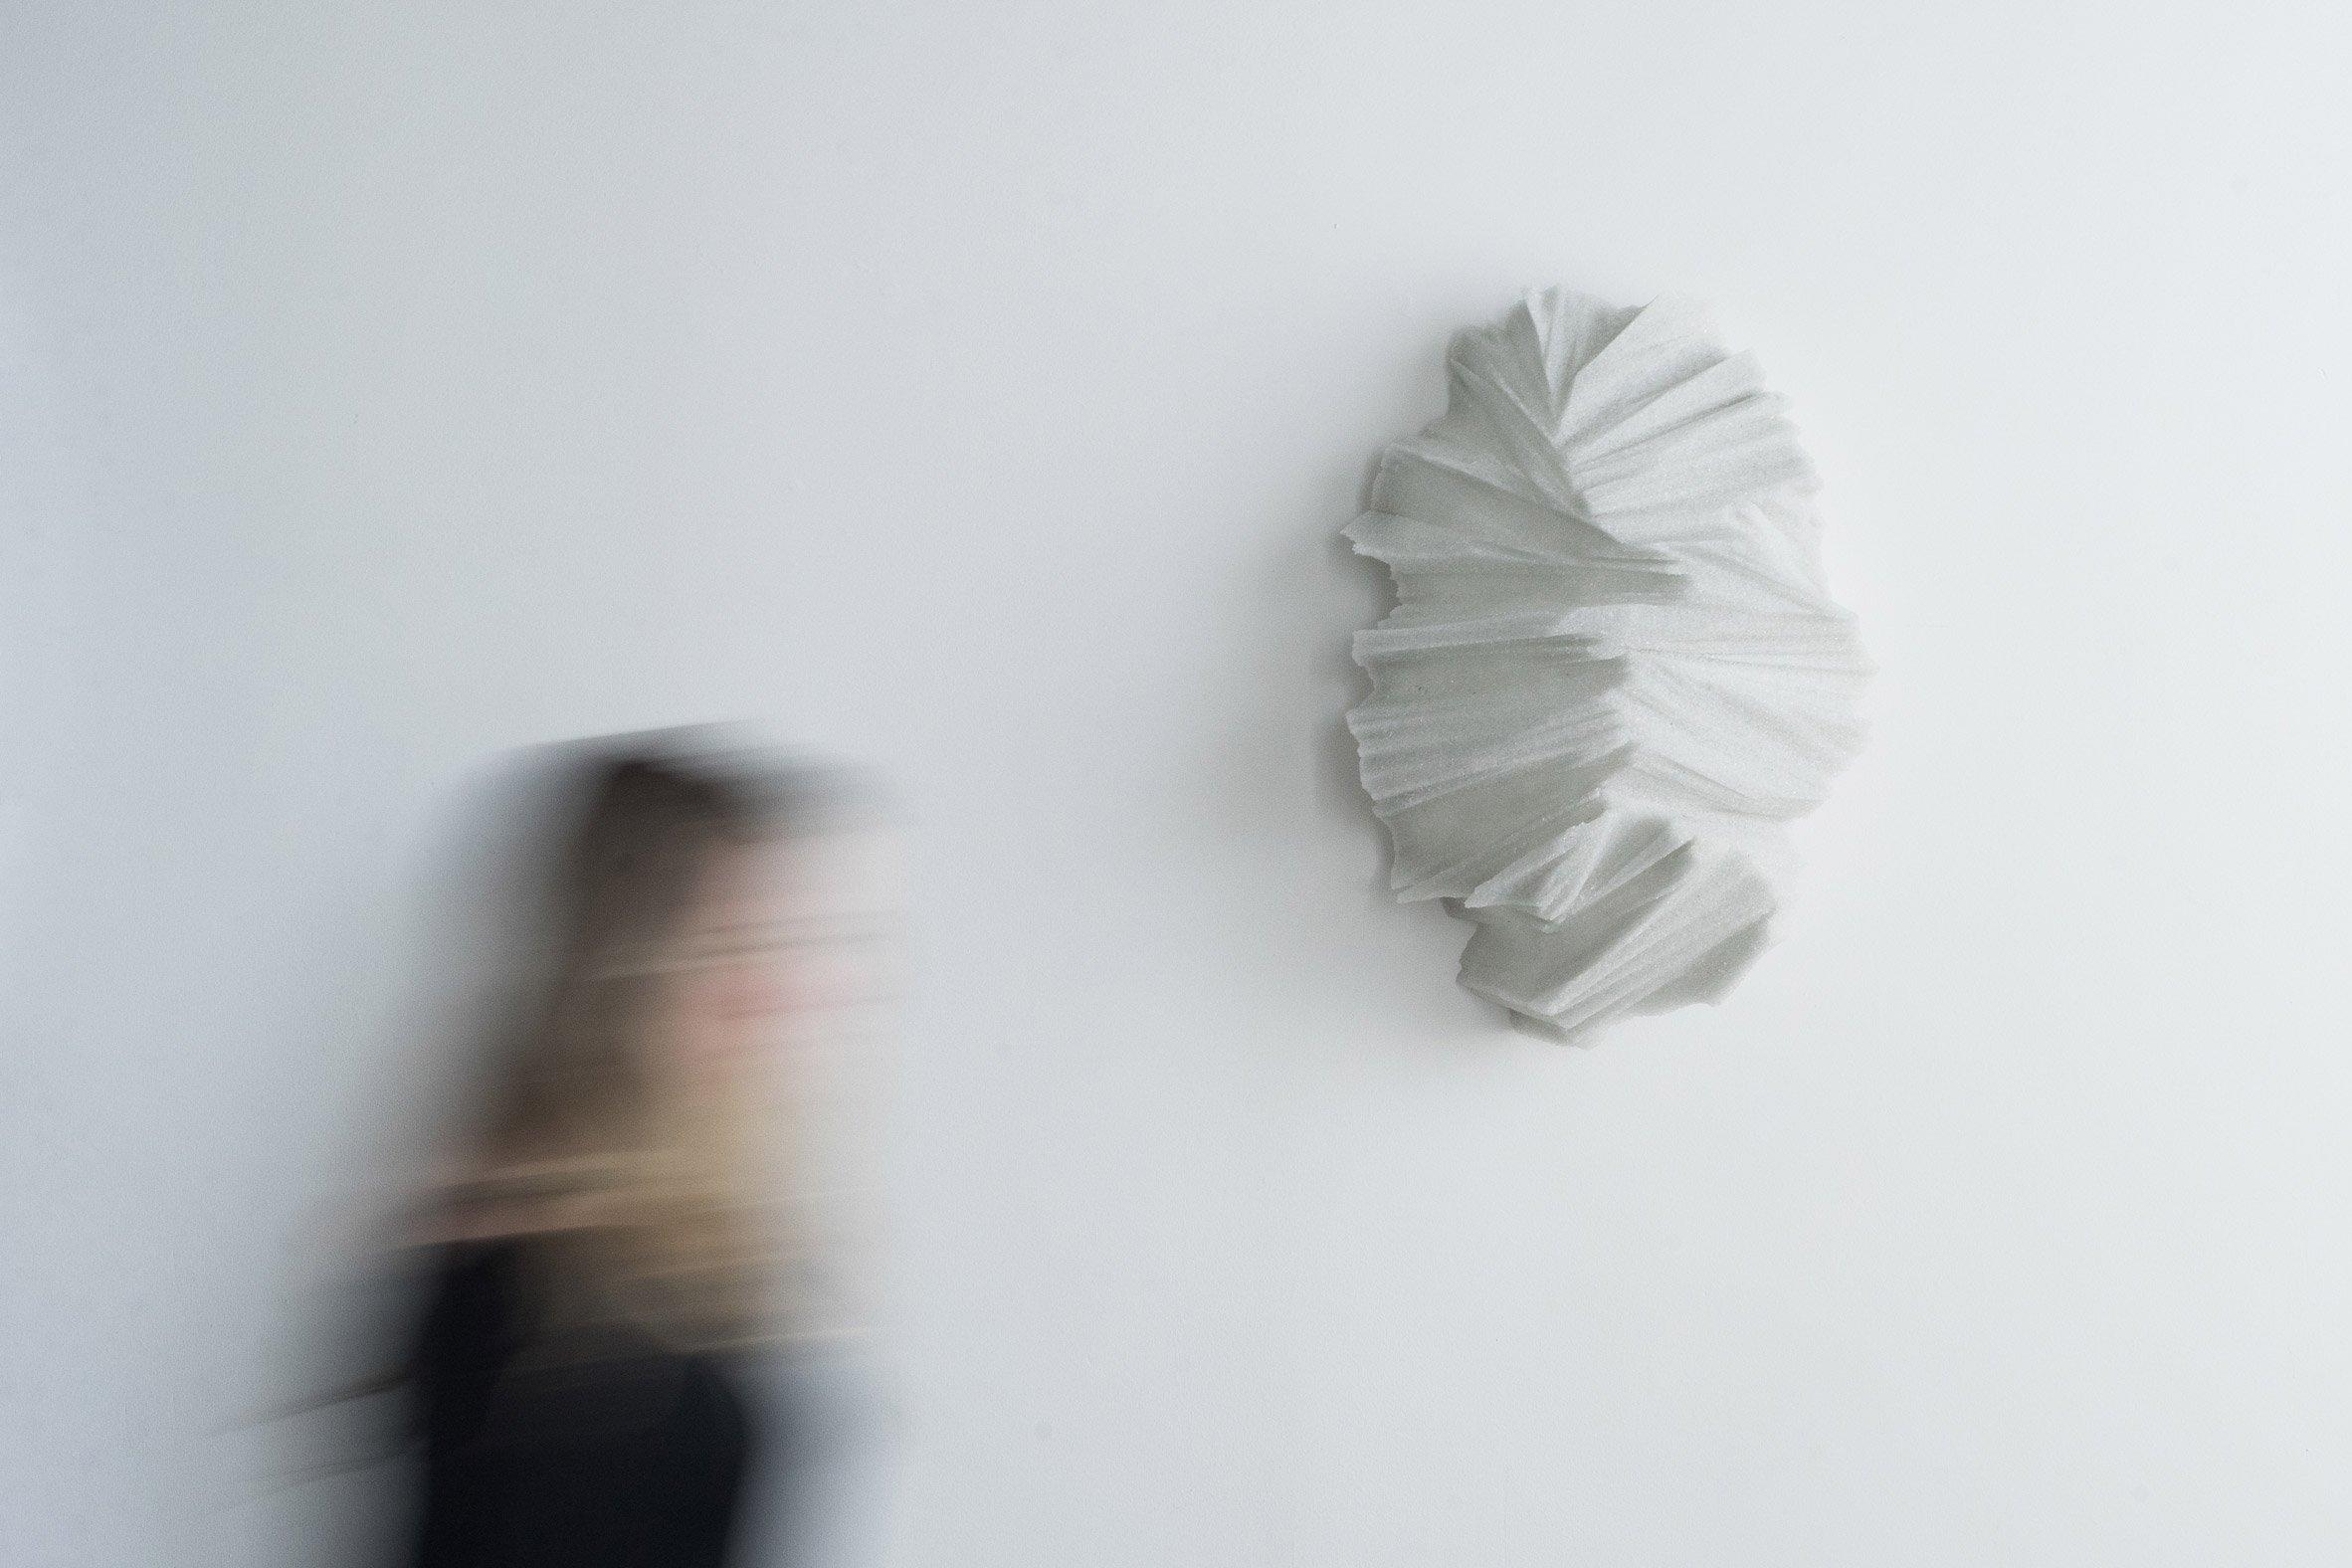 ghost-thaw-furniture-fernando-mastrangelo-collection-new-york-cast_dezeen_2364_col_7